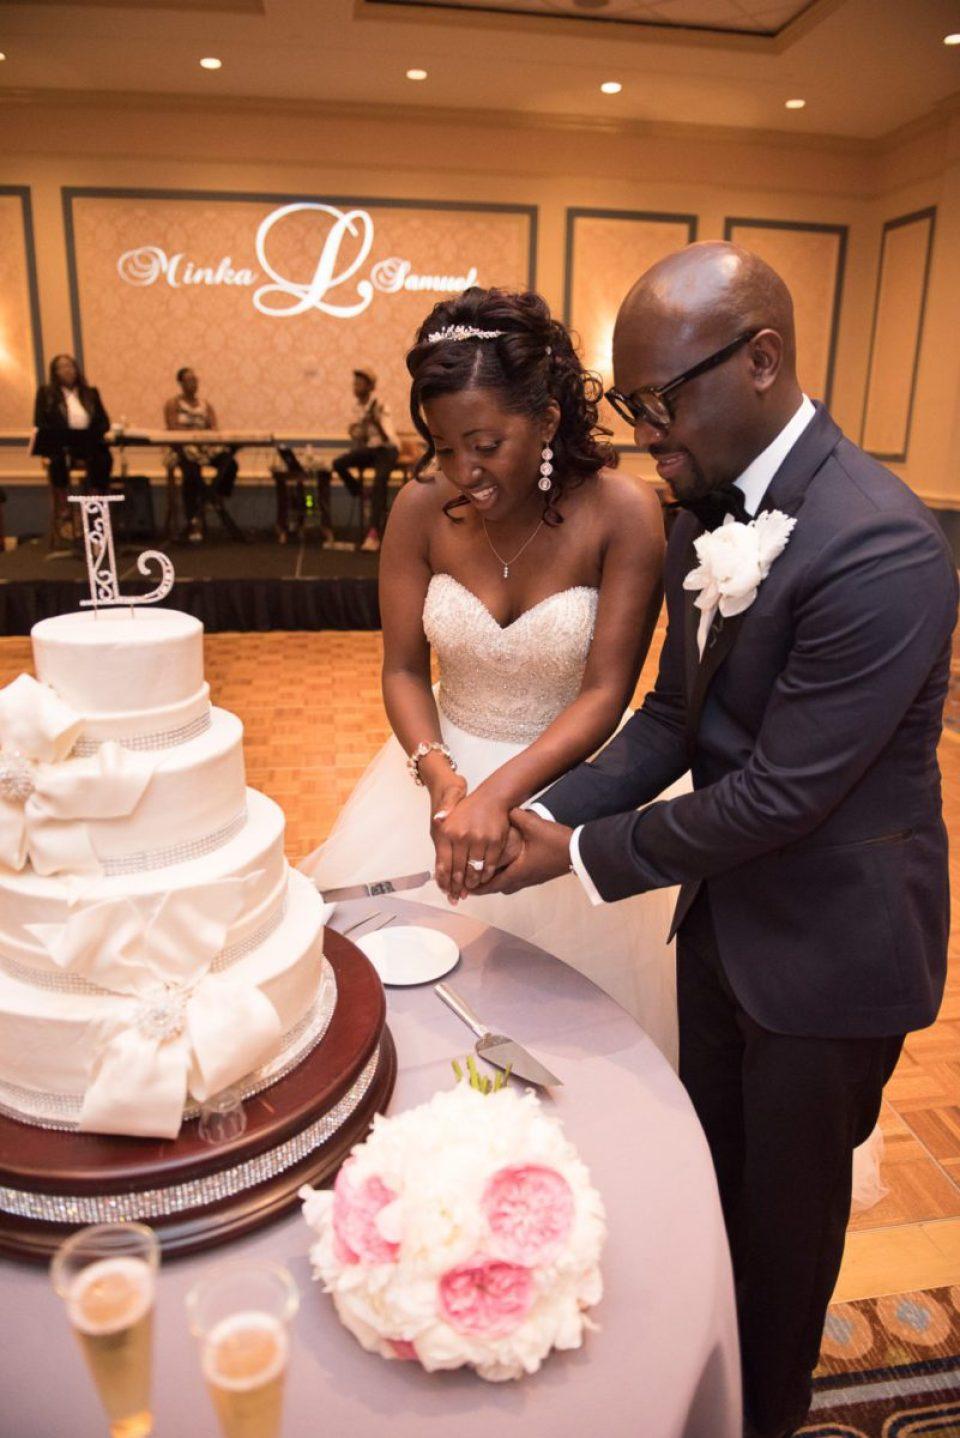 Cake-Cutting-Toasts-5-of-21-960x1438 Classic Charleston Nuptials